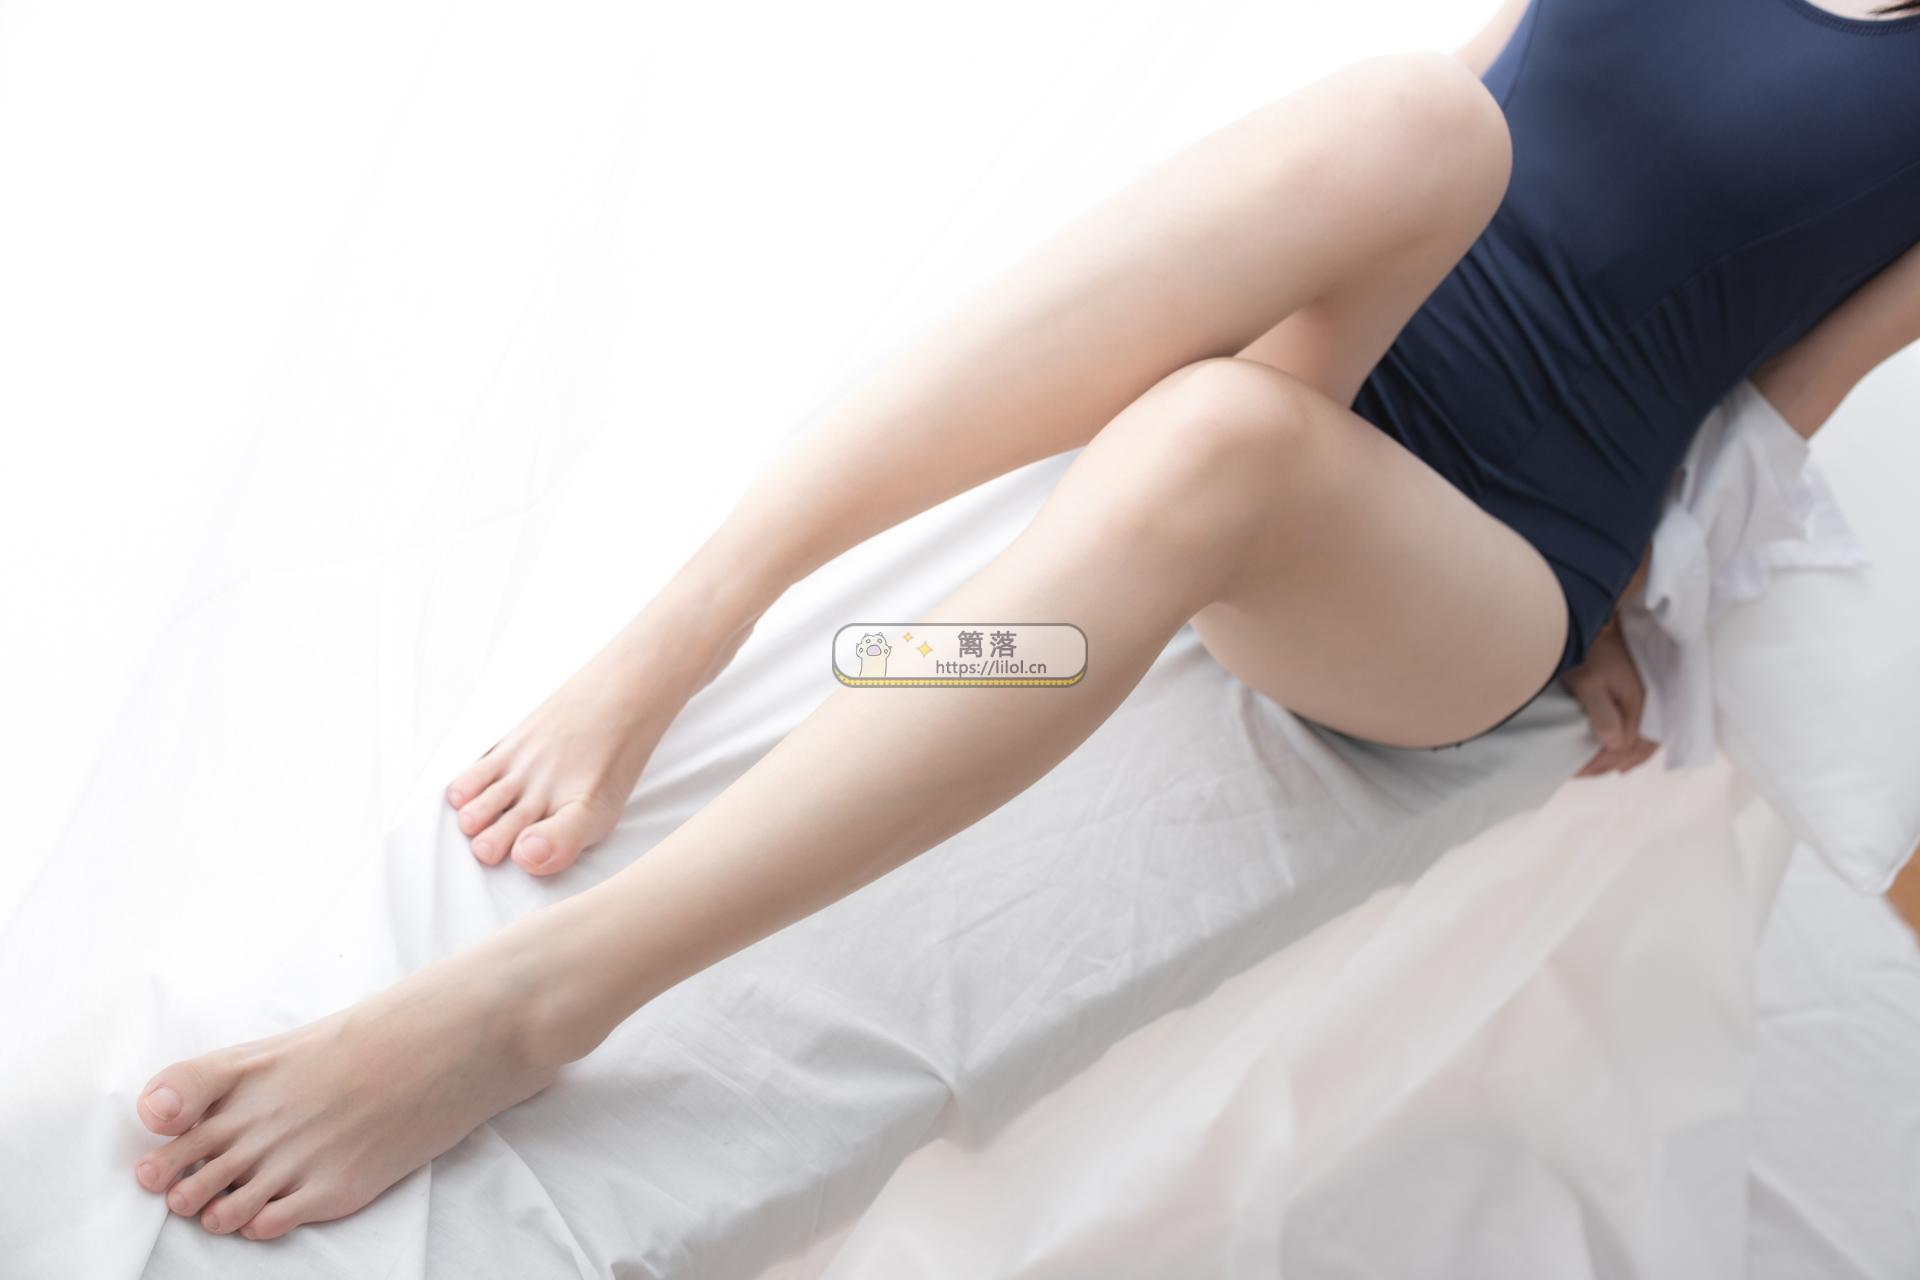 【LOVEPLUS系列】森萝财团写真 LOVEPLUS-002 性感超薄黑丝蓝色吊带双马尾萝莉 [110图-0视频-776MB] LOVEPLUS系列 第4张